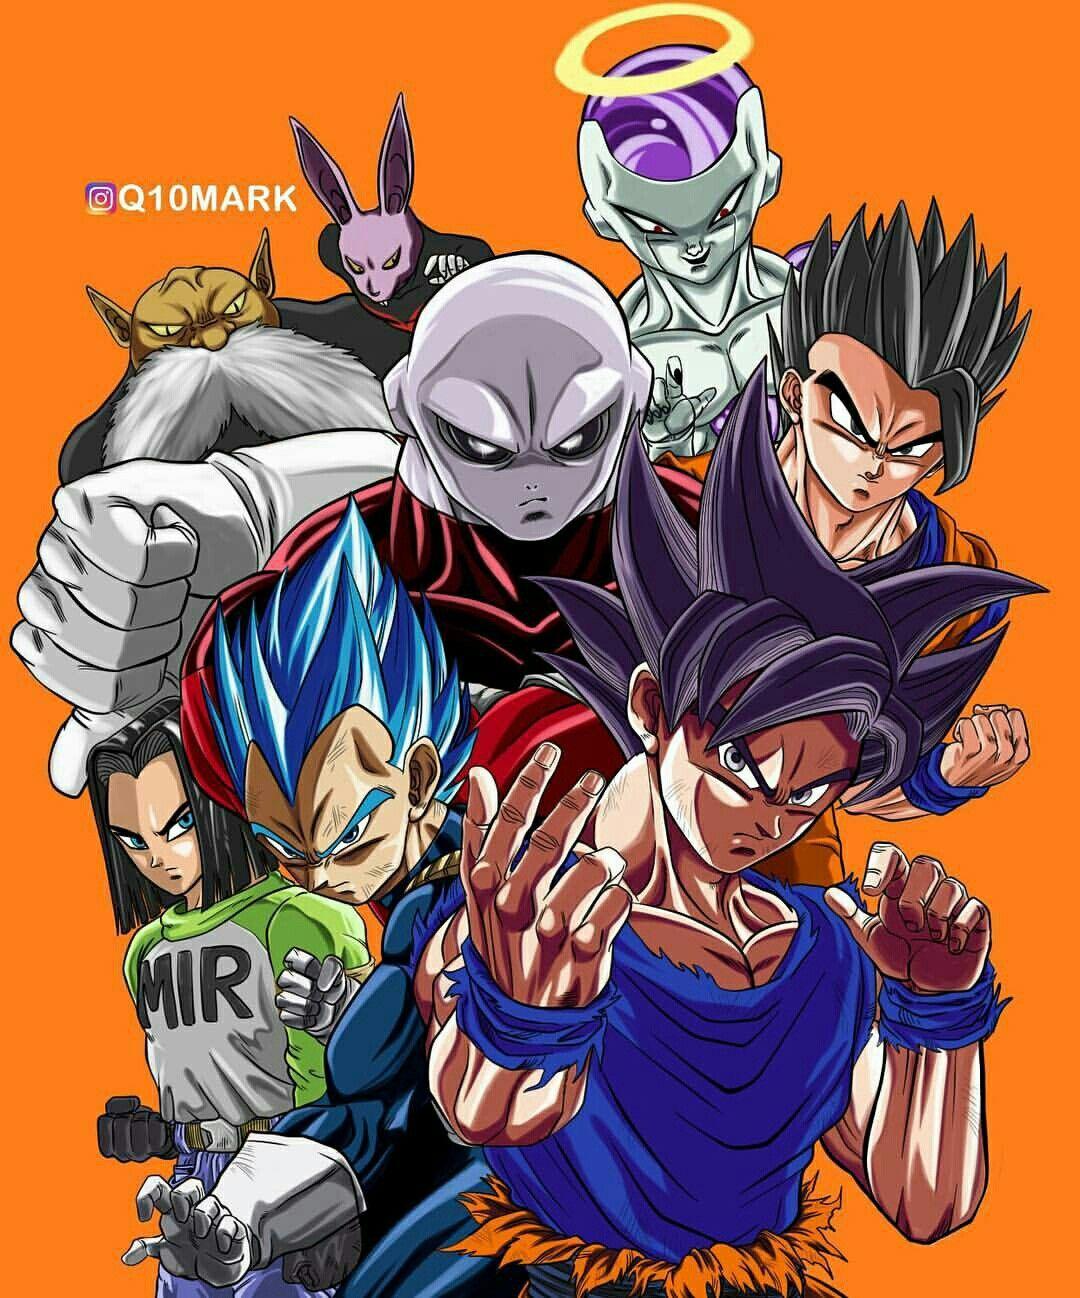 Goku contra gohan y goten latino dating